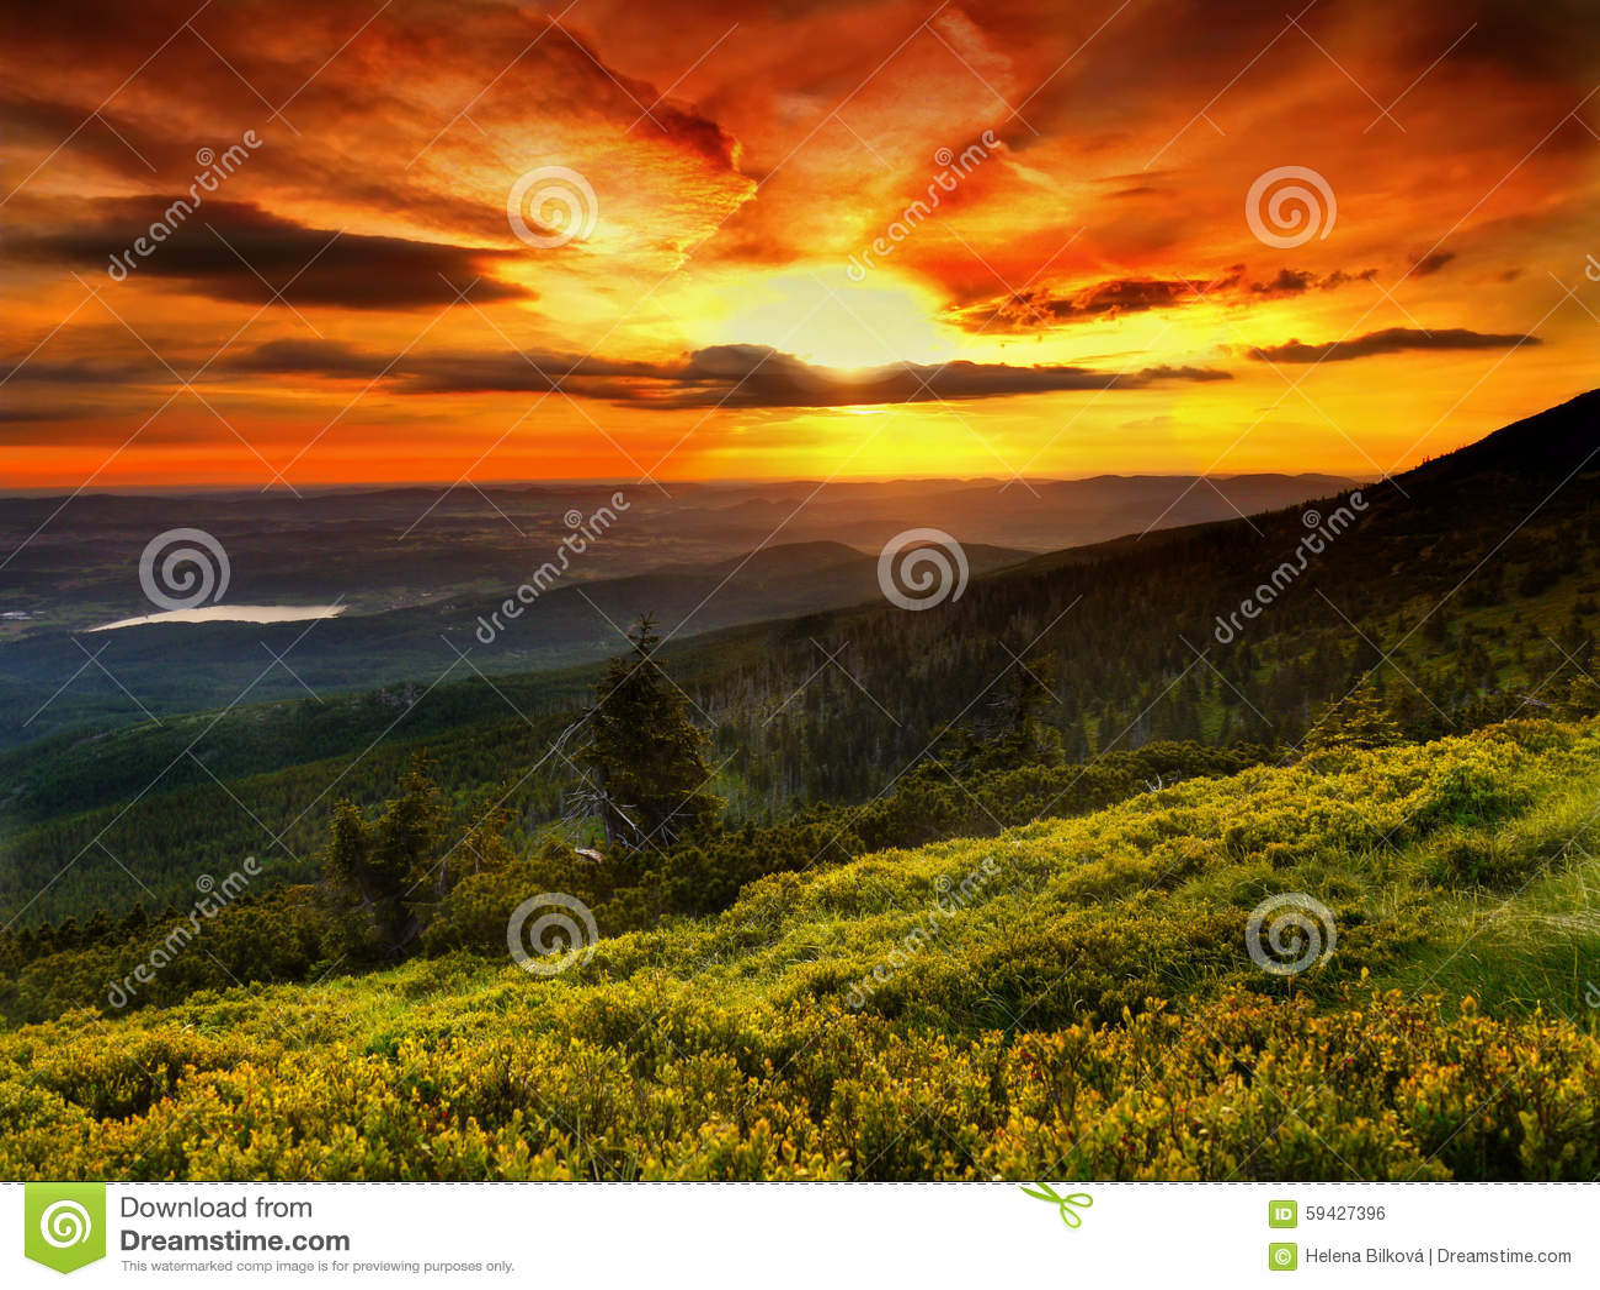 Landscape, Magic colours, Sunrise, Mountain meadow